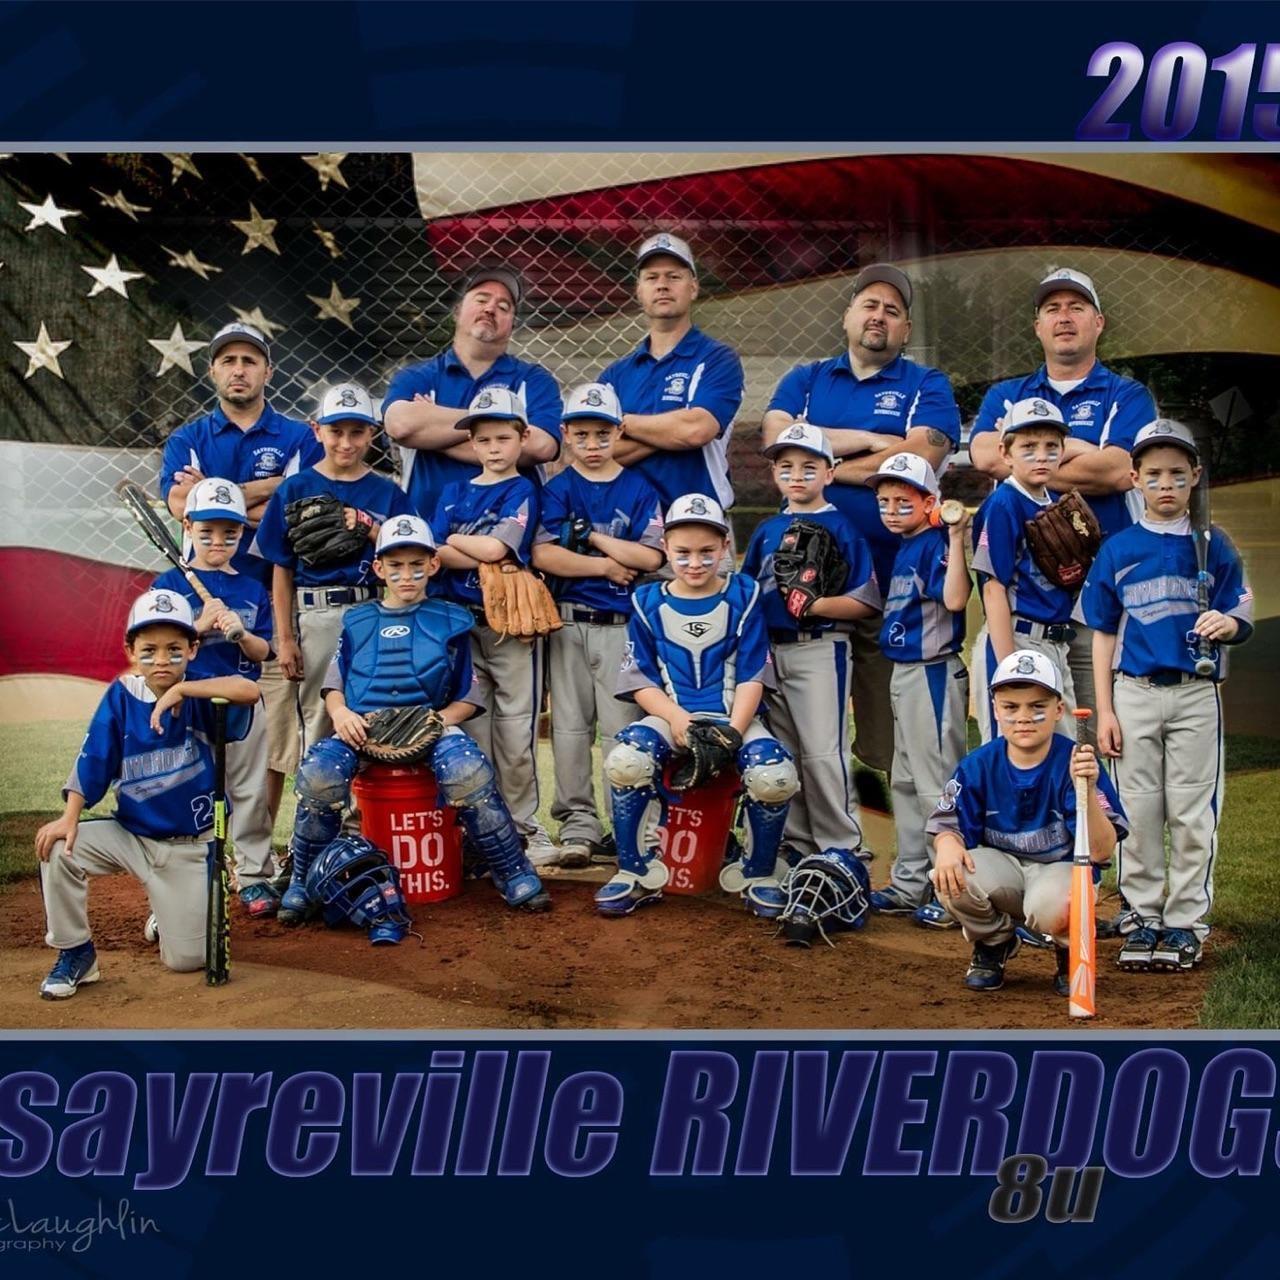 Sayreville Riverdogs Blue 10U